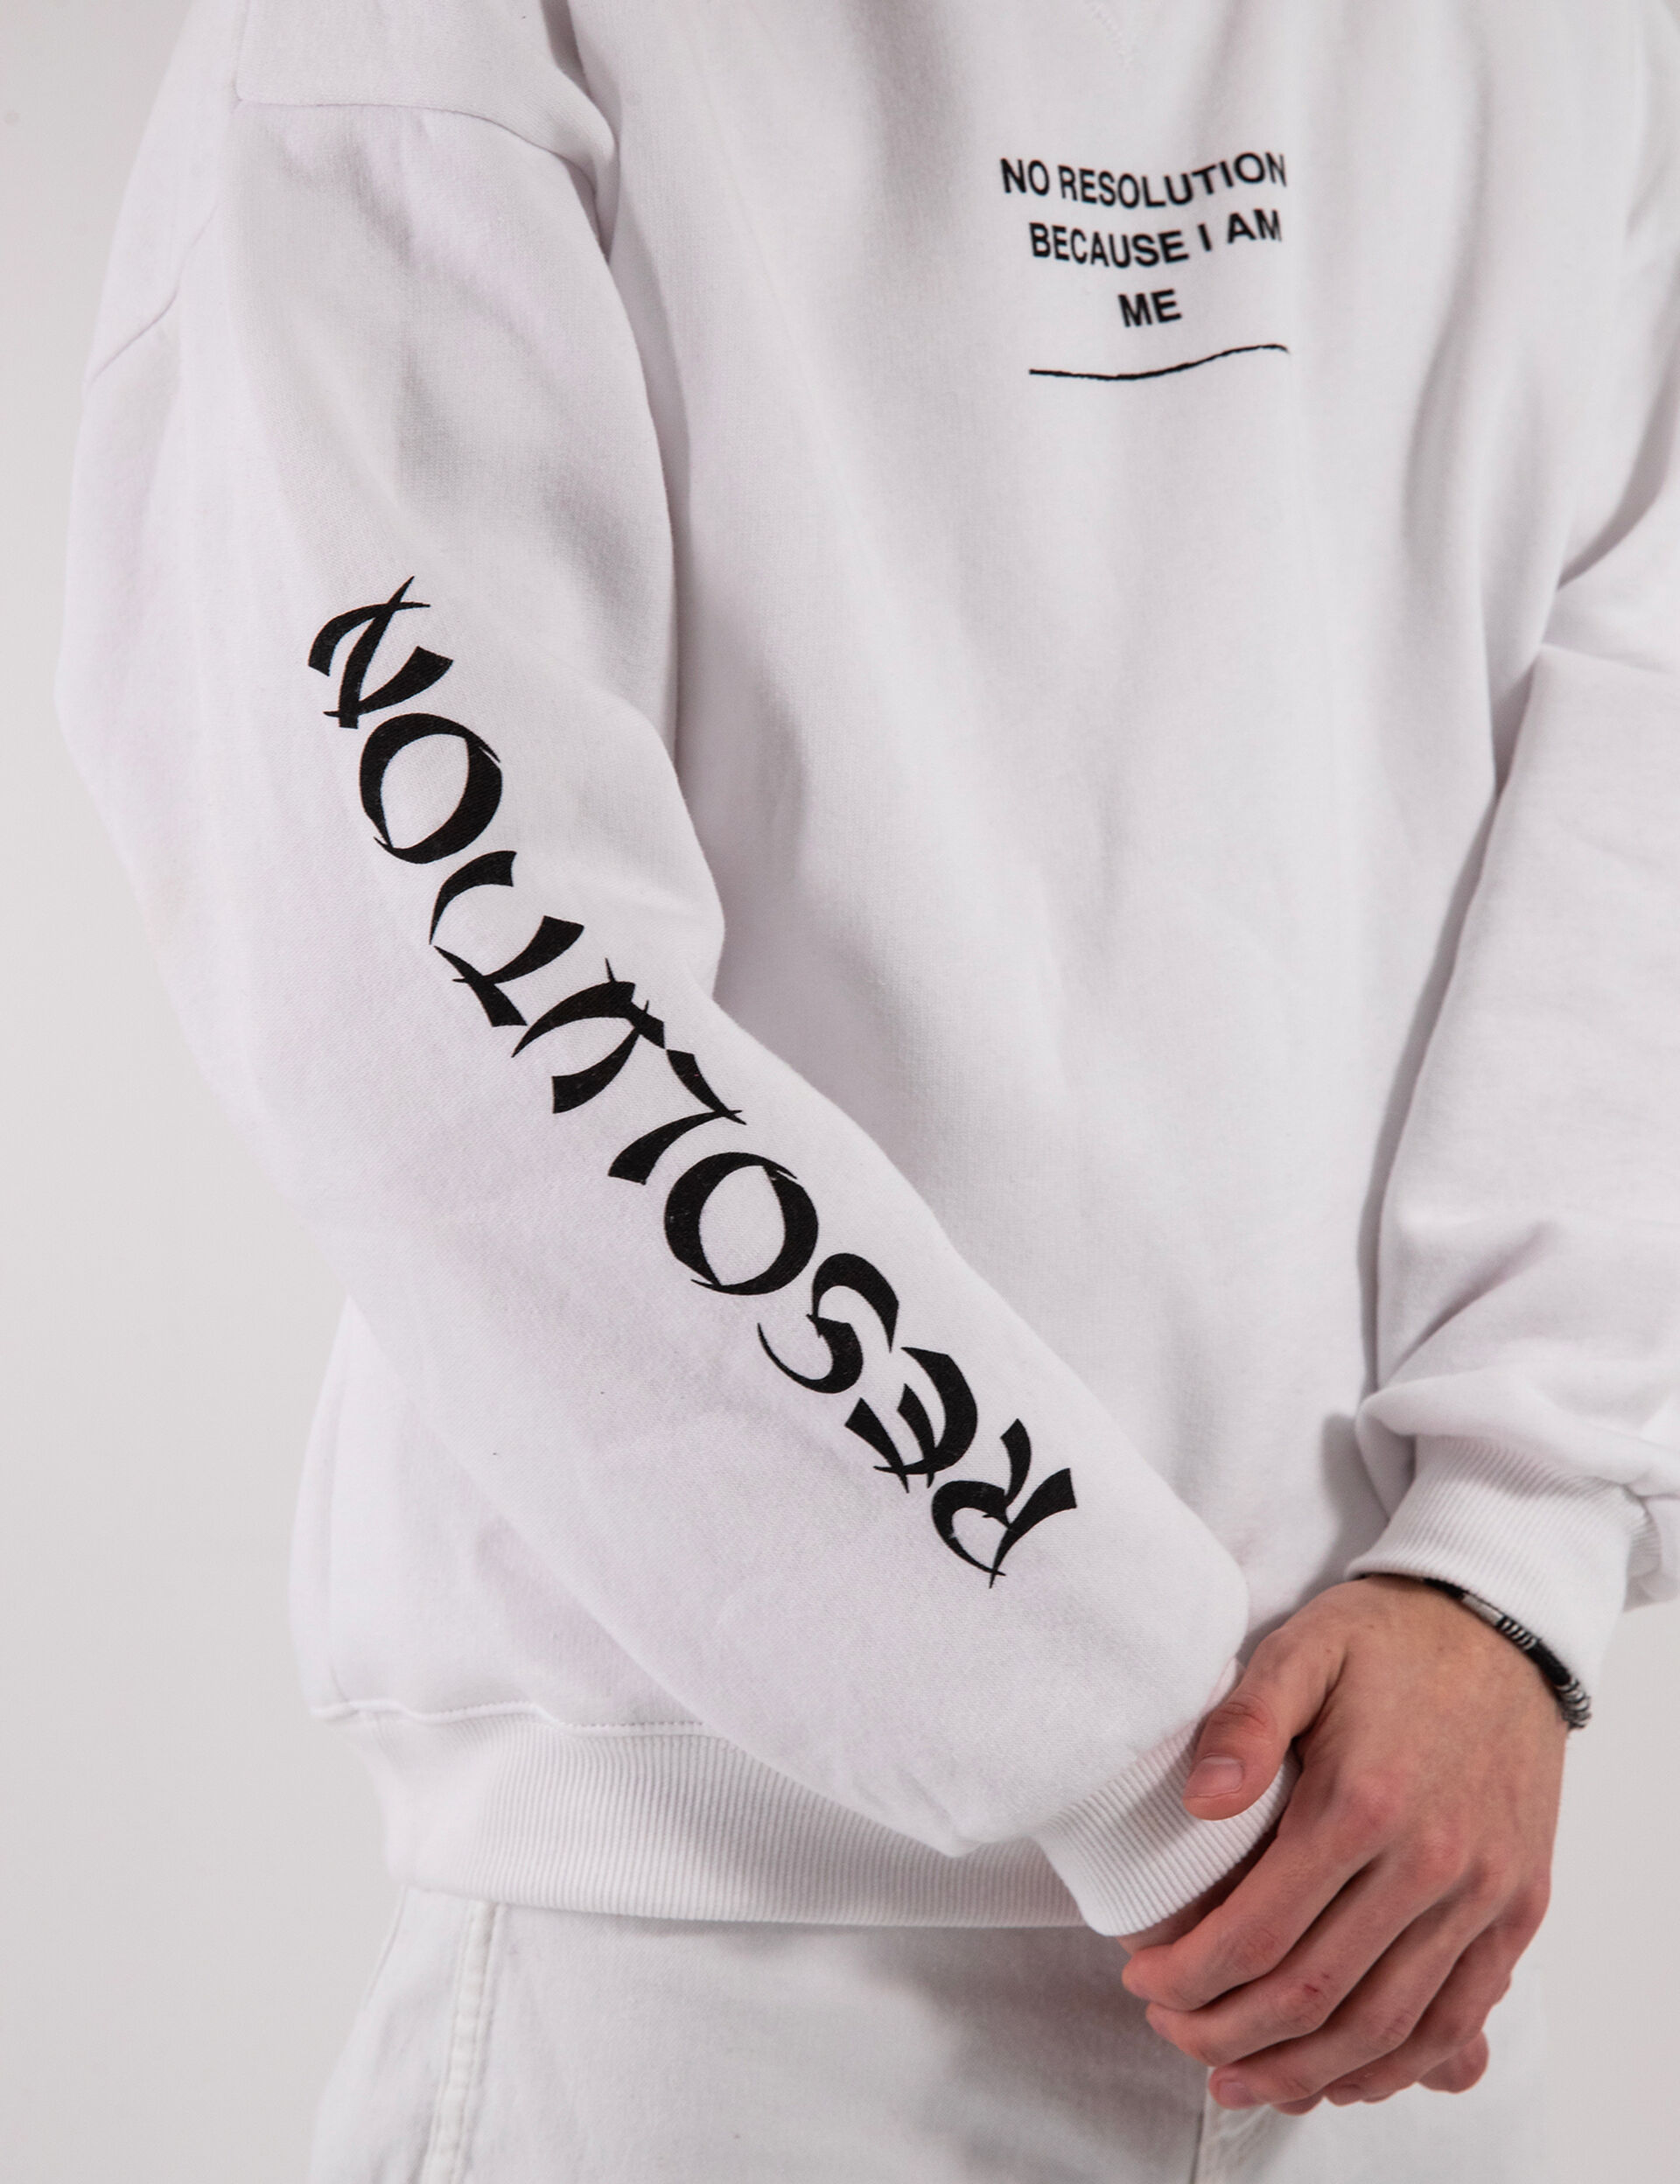 Messy sweatshirt